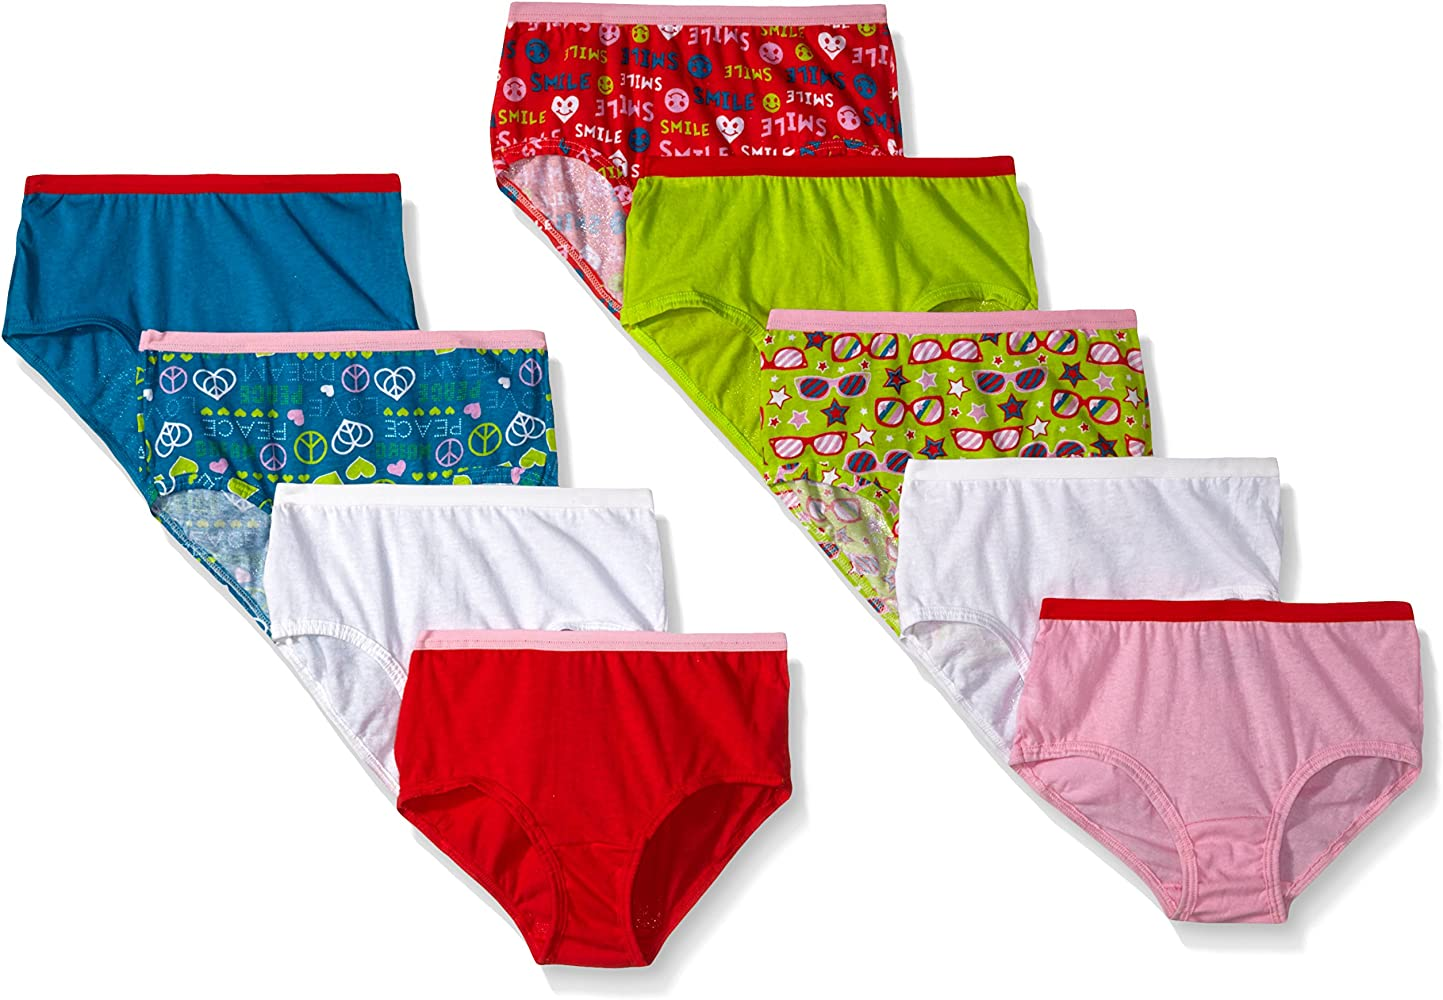 Assorted Multipacks Packs of 22 /& 24 Fruit of the Loom Girls Big Cotton Underwear